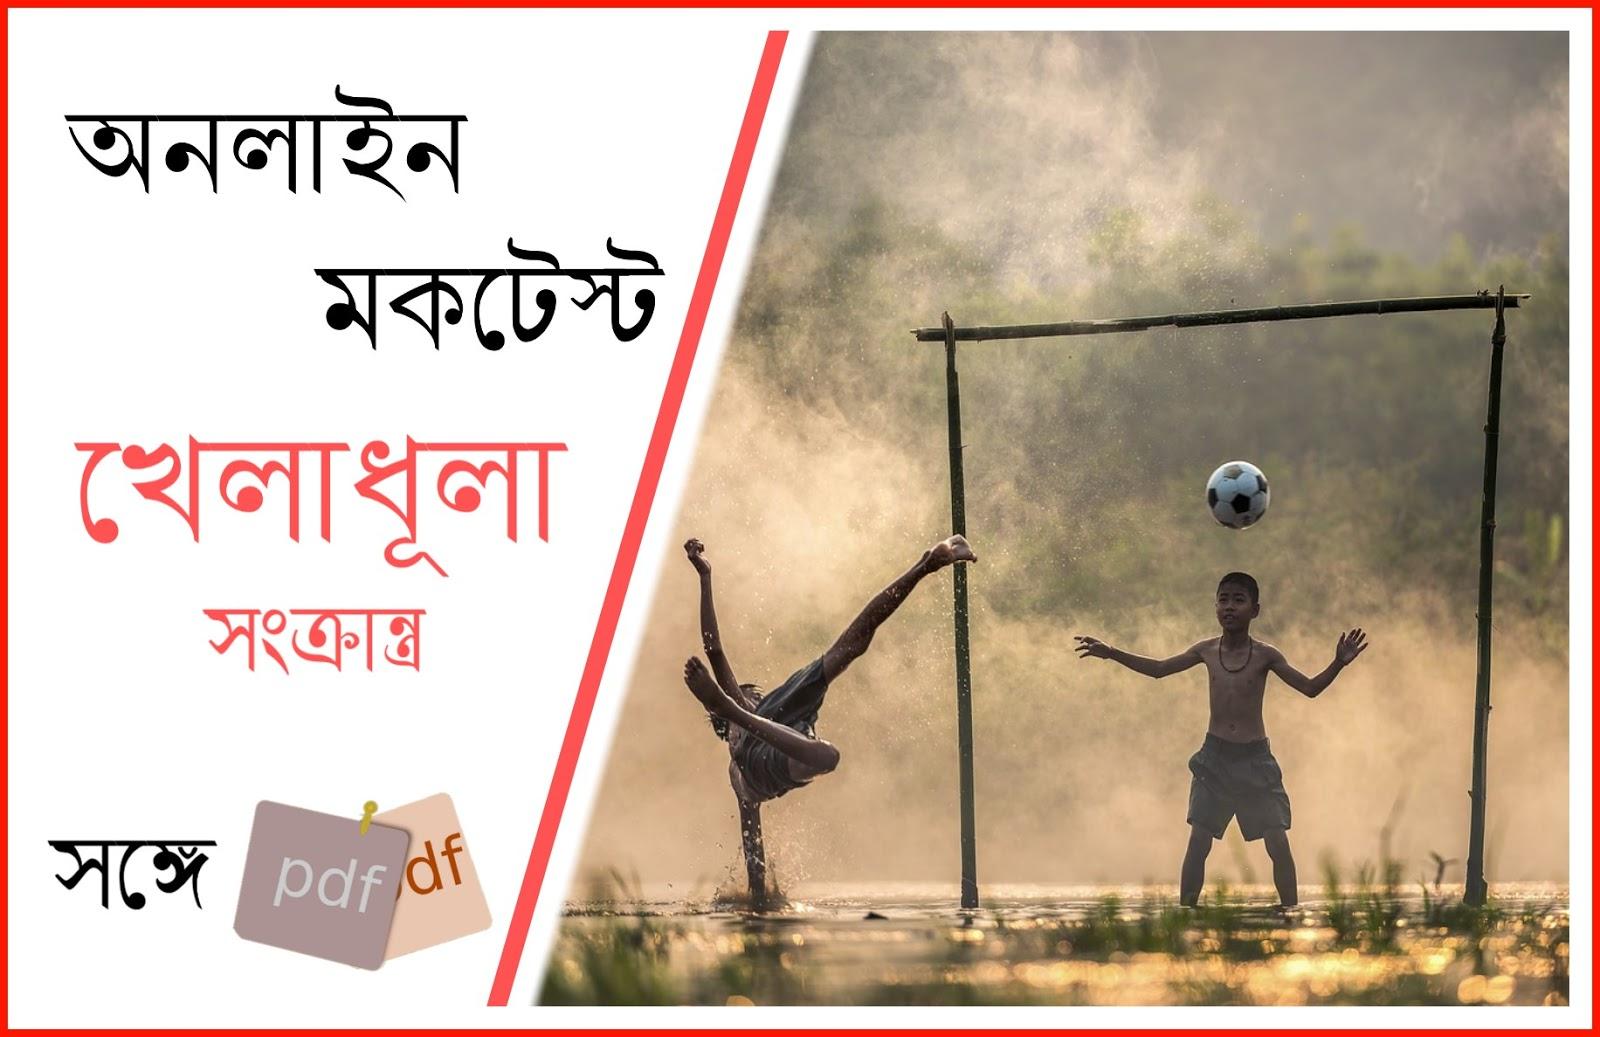 Bengali Quiz : Sports GK - খেলাধূলা বিষয়ক MCQ প্রশ্ন ও উত্তর PDF